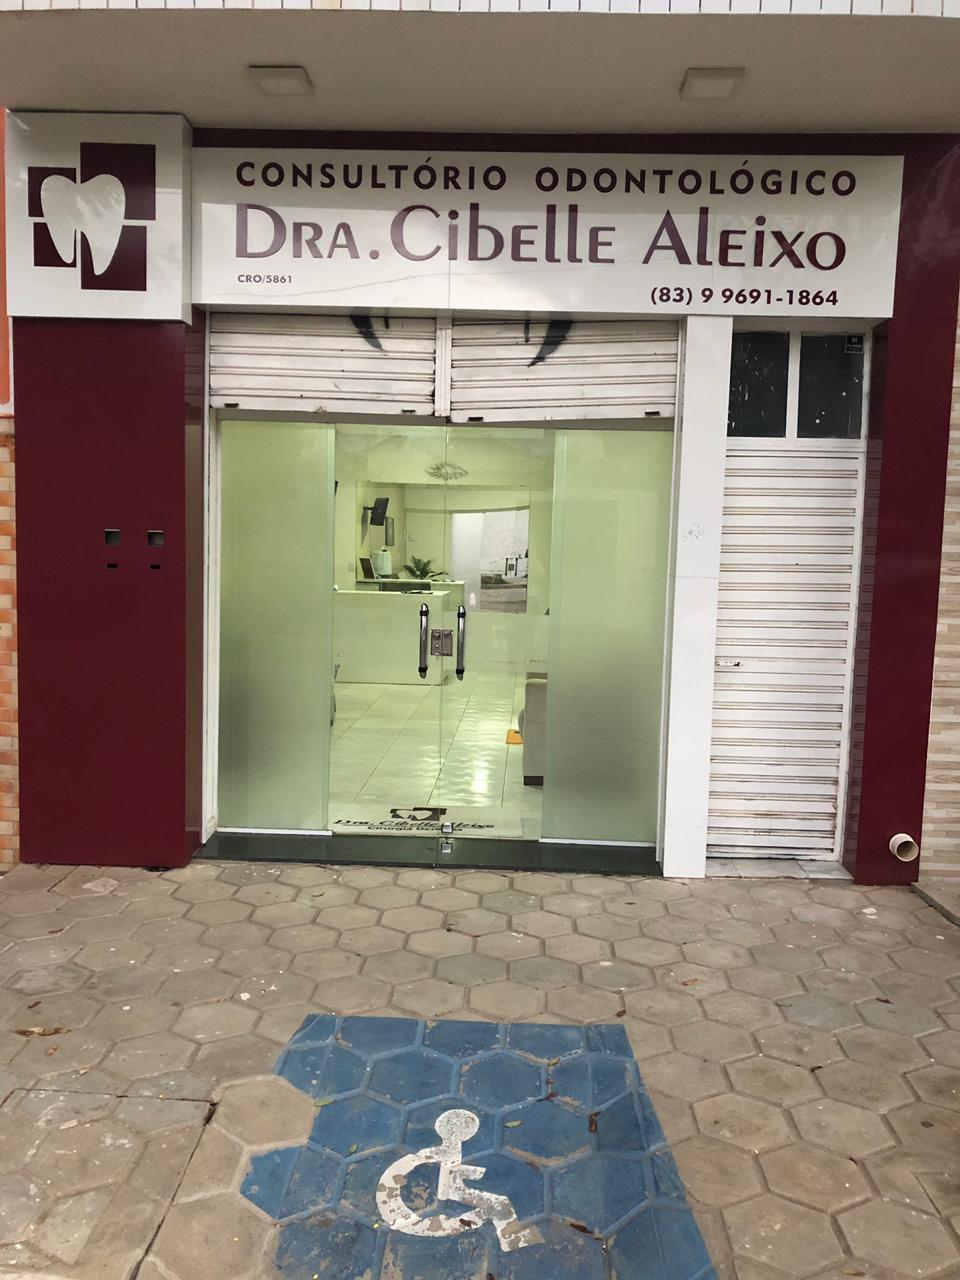 WhatsApp-Image-2019-07-15-at-17.34.48 Consultório Odontológico Dra Cibelle Aleixo